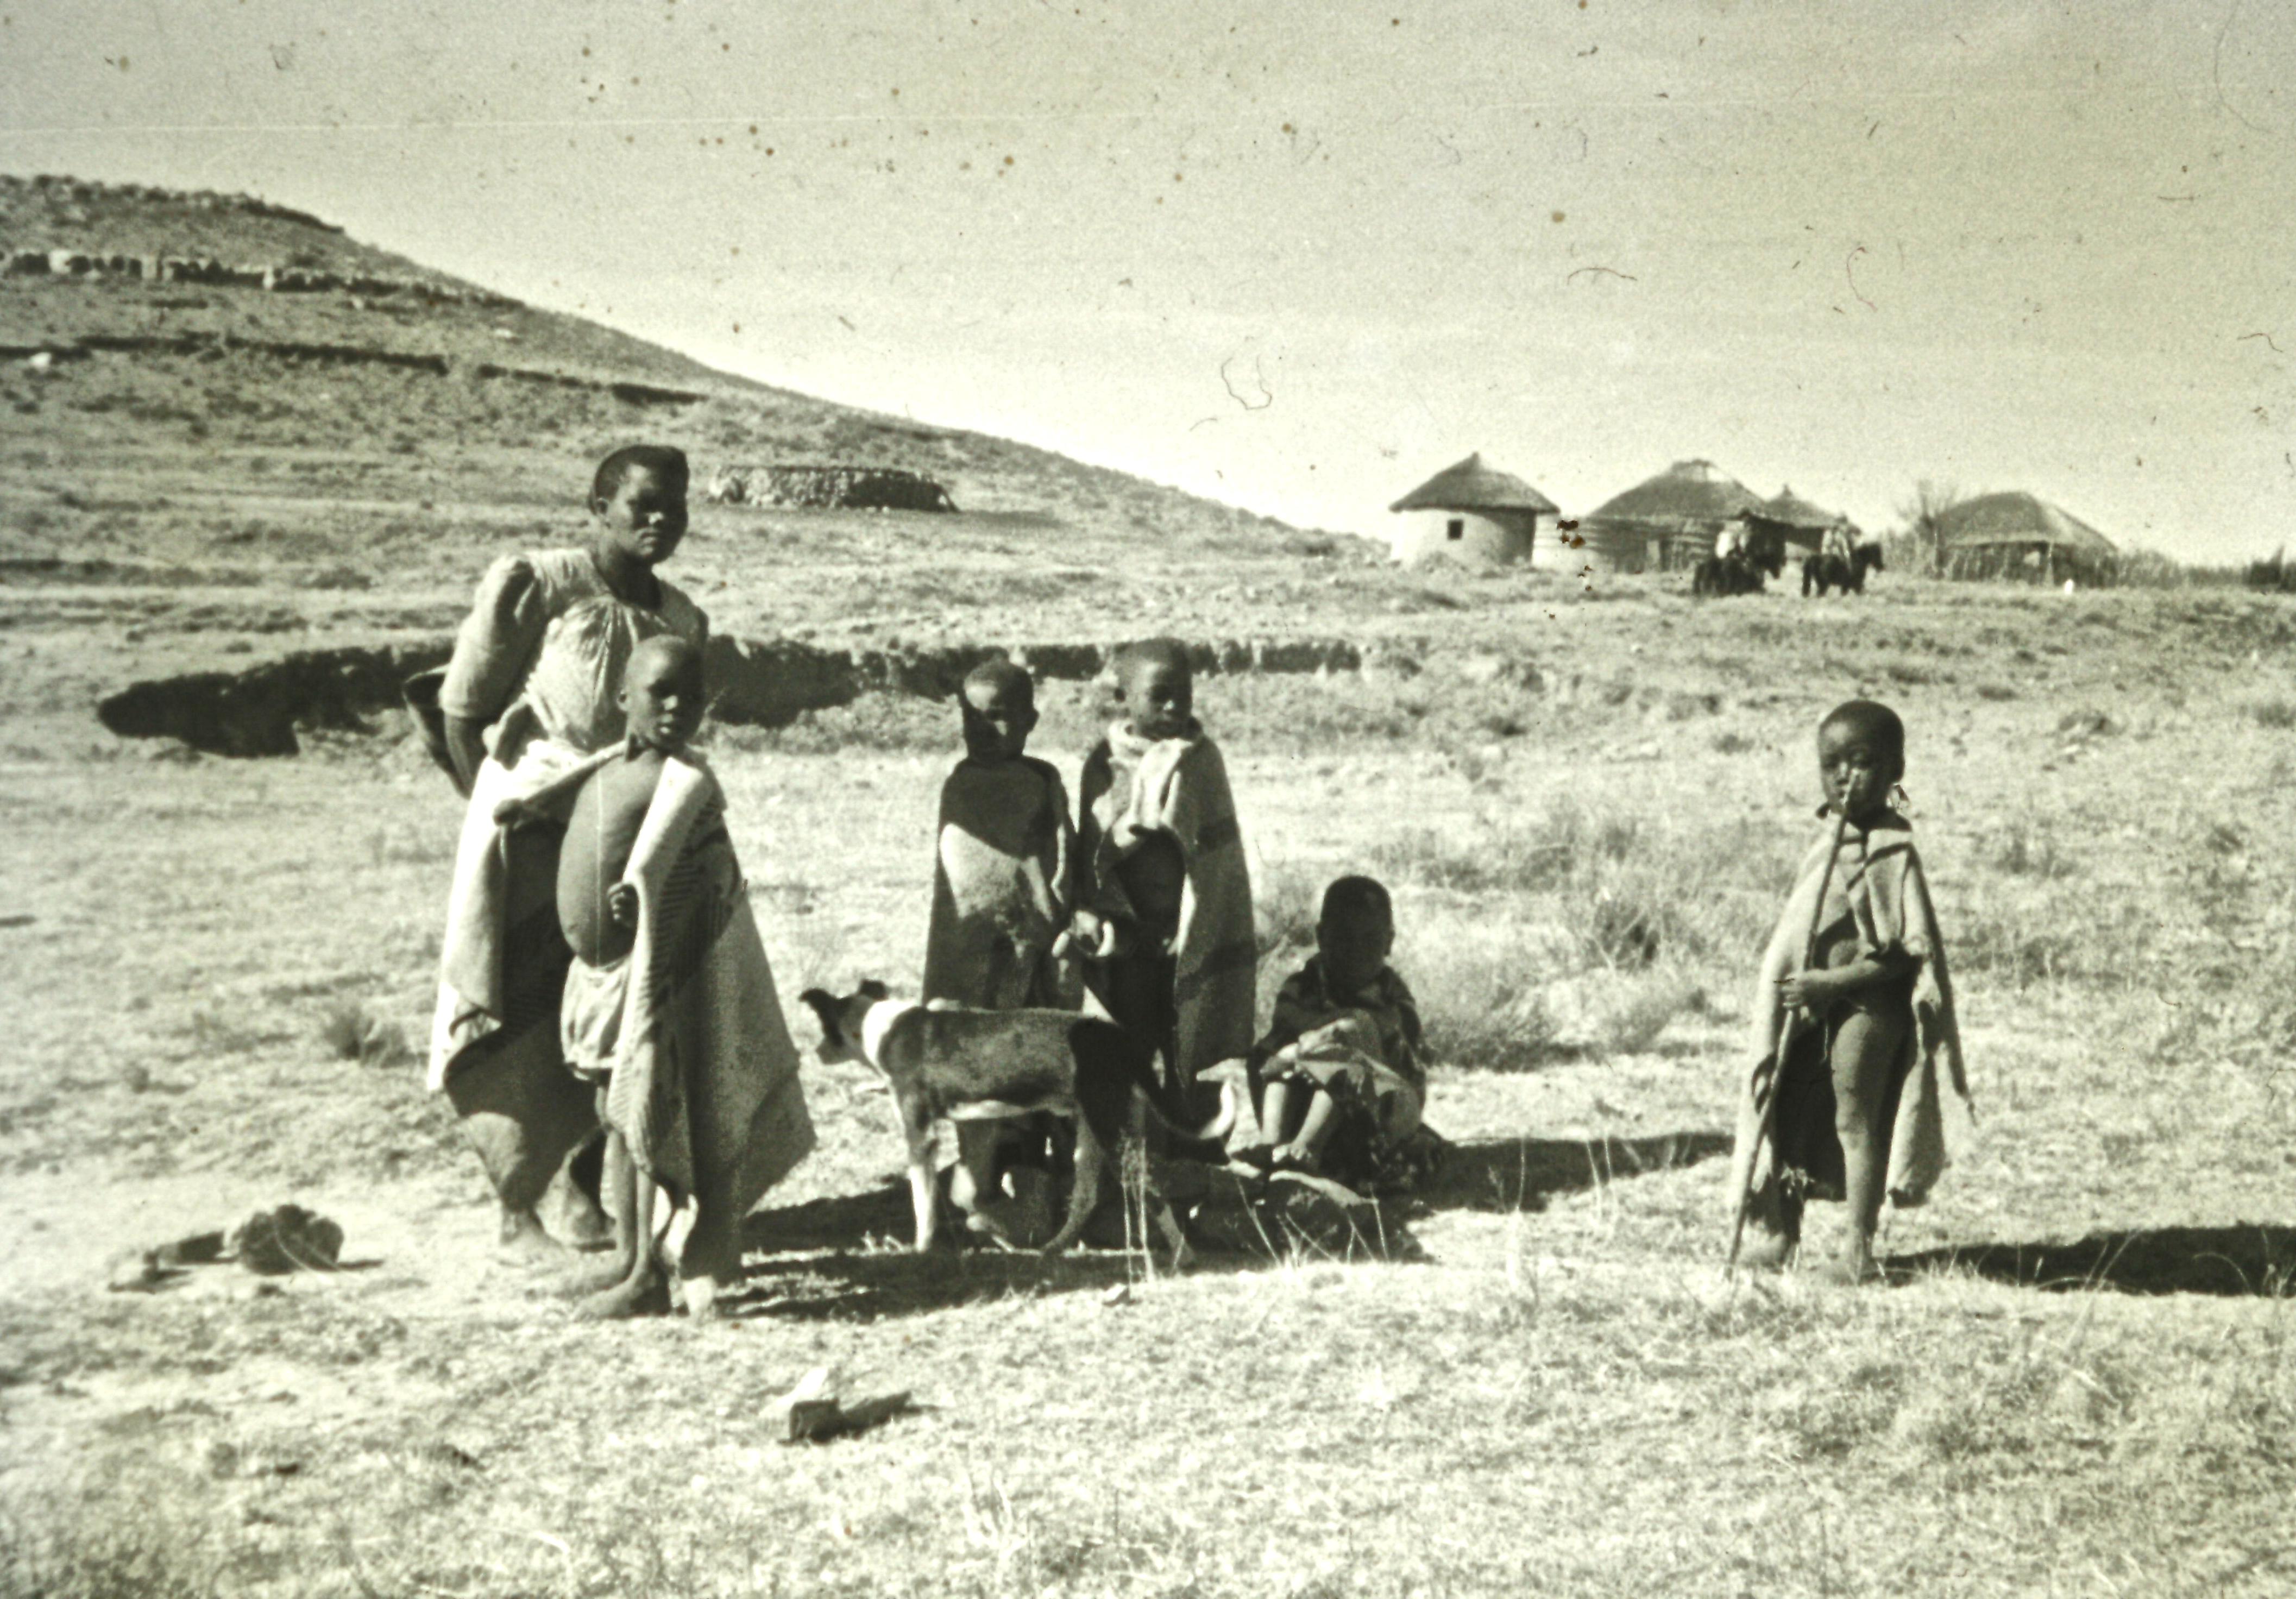 Basutho family group